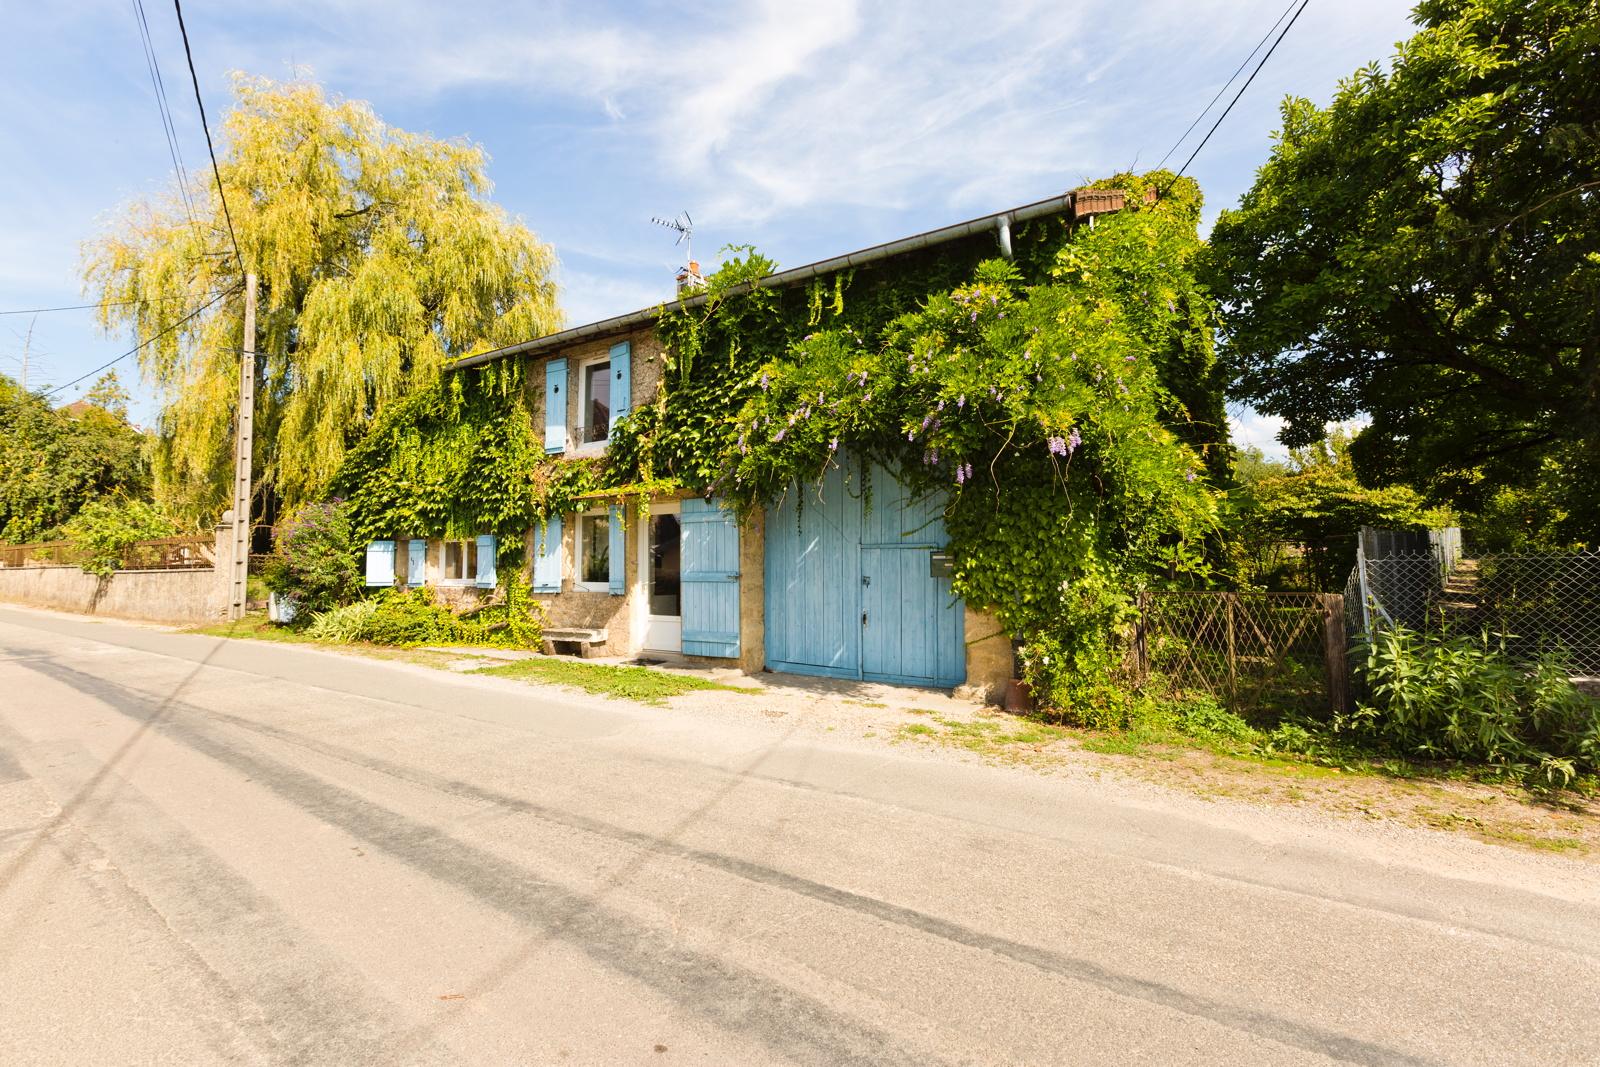 Vente maison Entre arbois et poligny